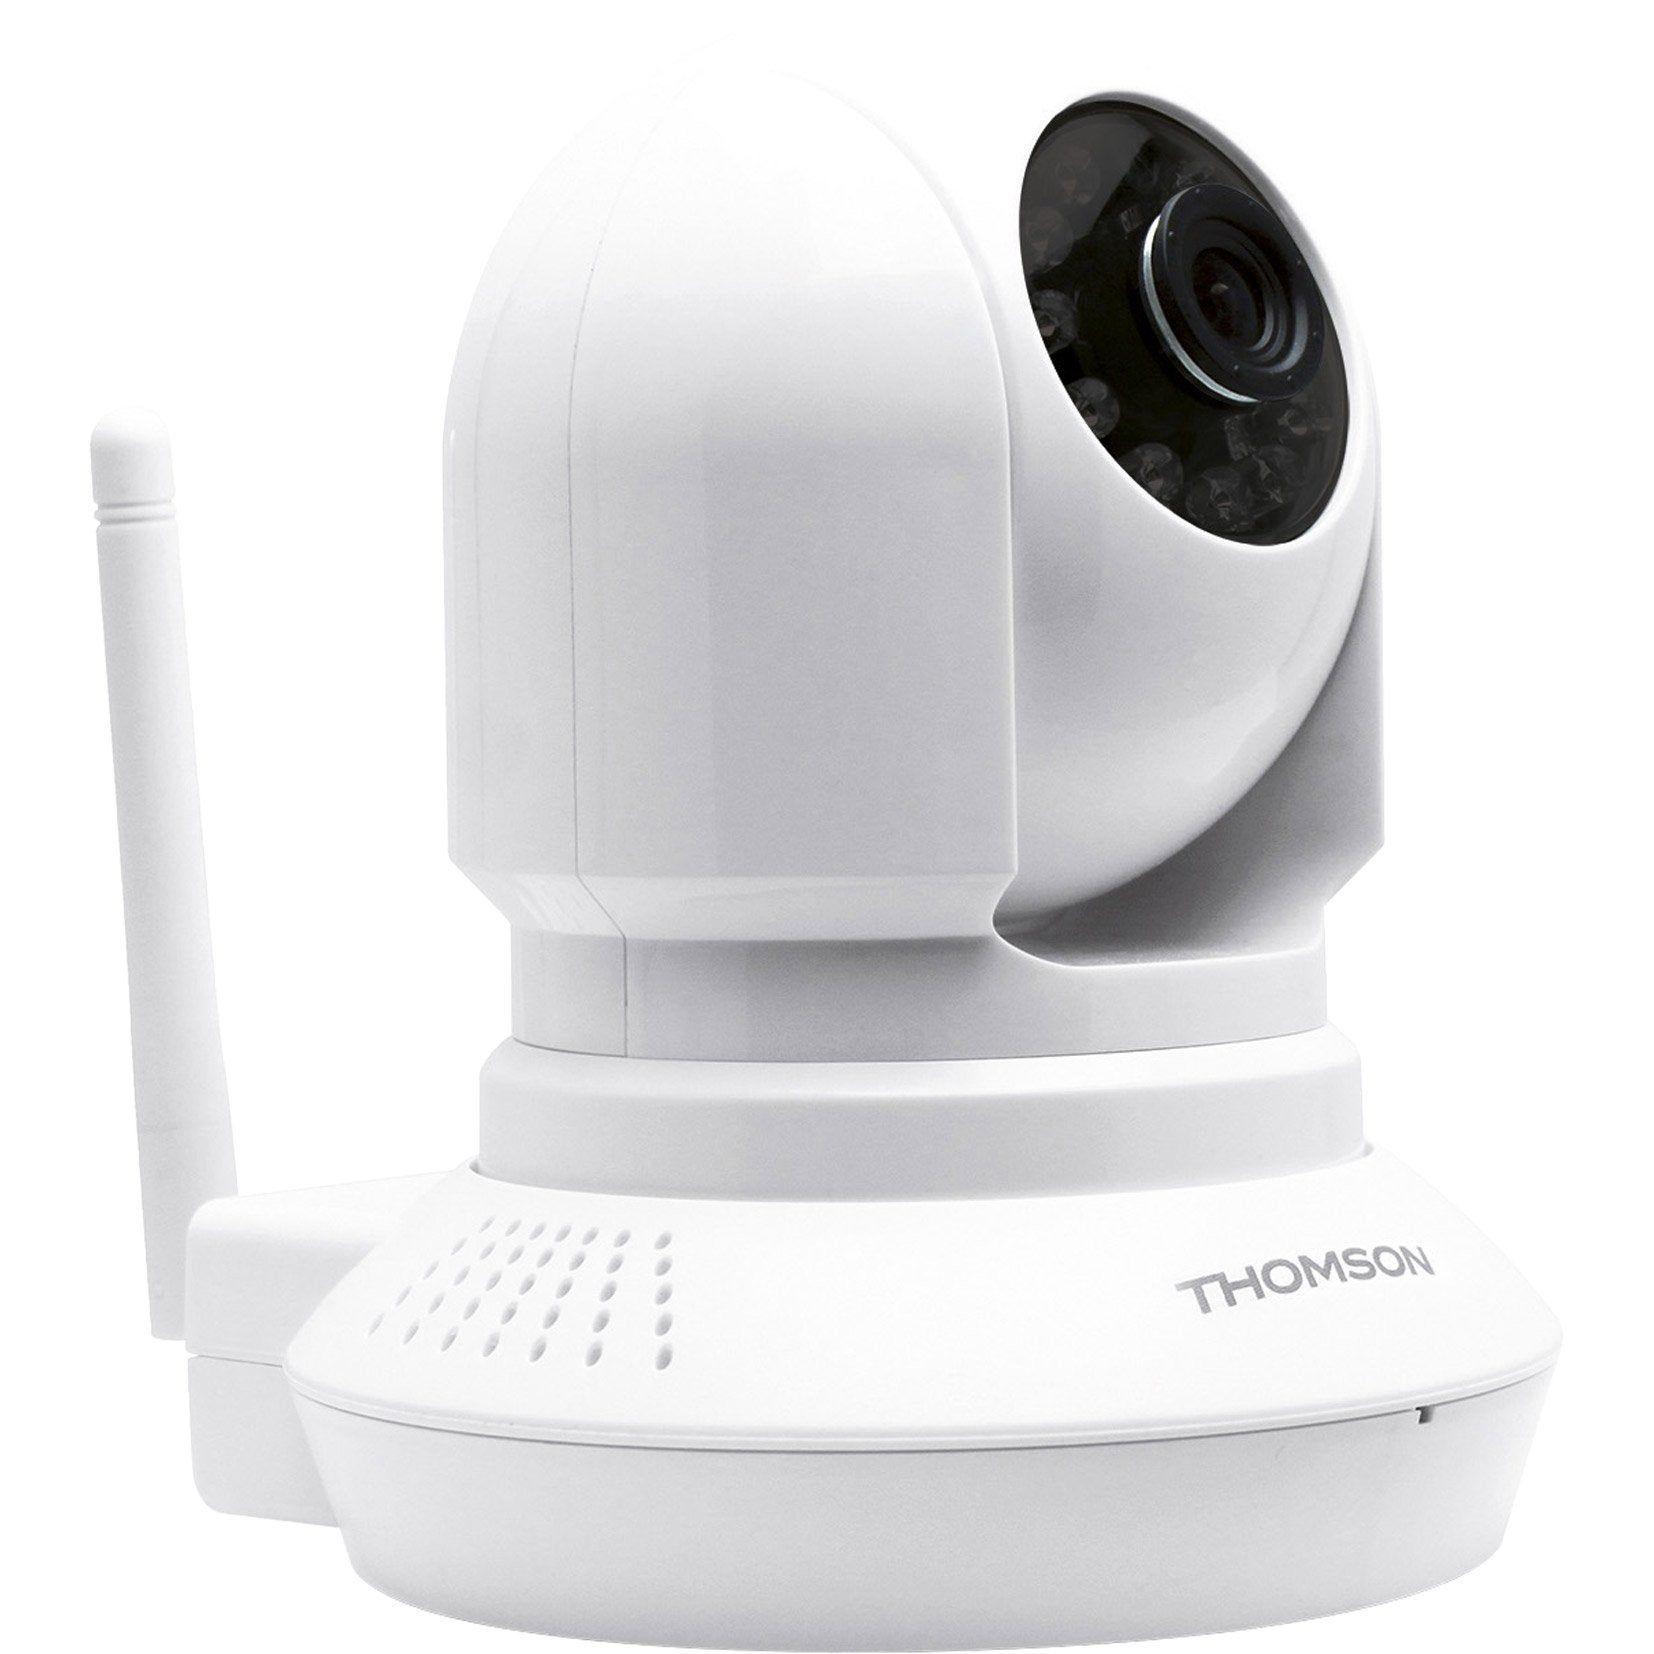 Camera De Surveillance Interieure Motorisee Sans Fil Dsc 523w Blanc Thomson Camera Surveillance Motorise Et Camera